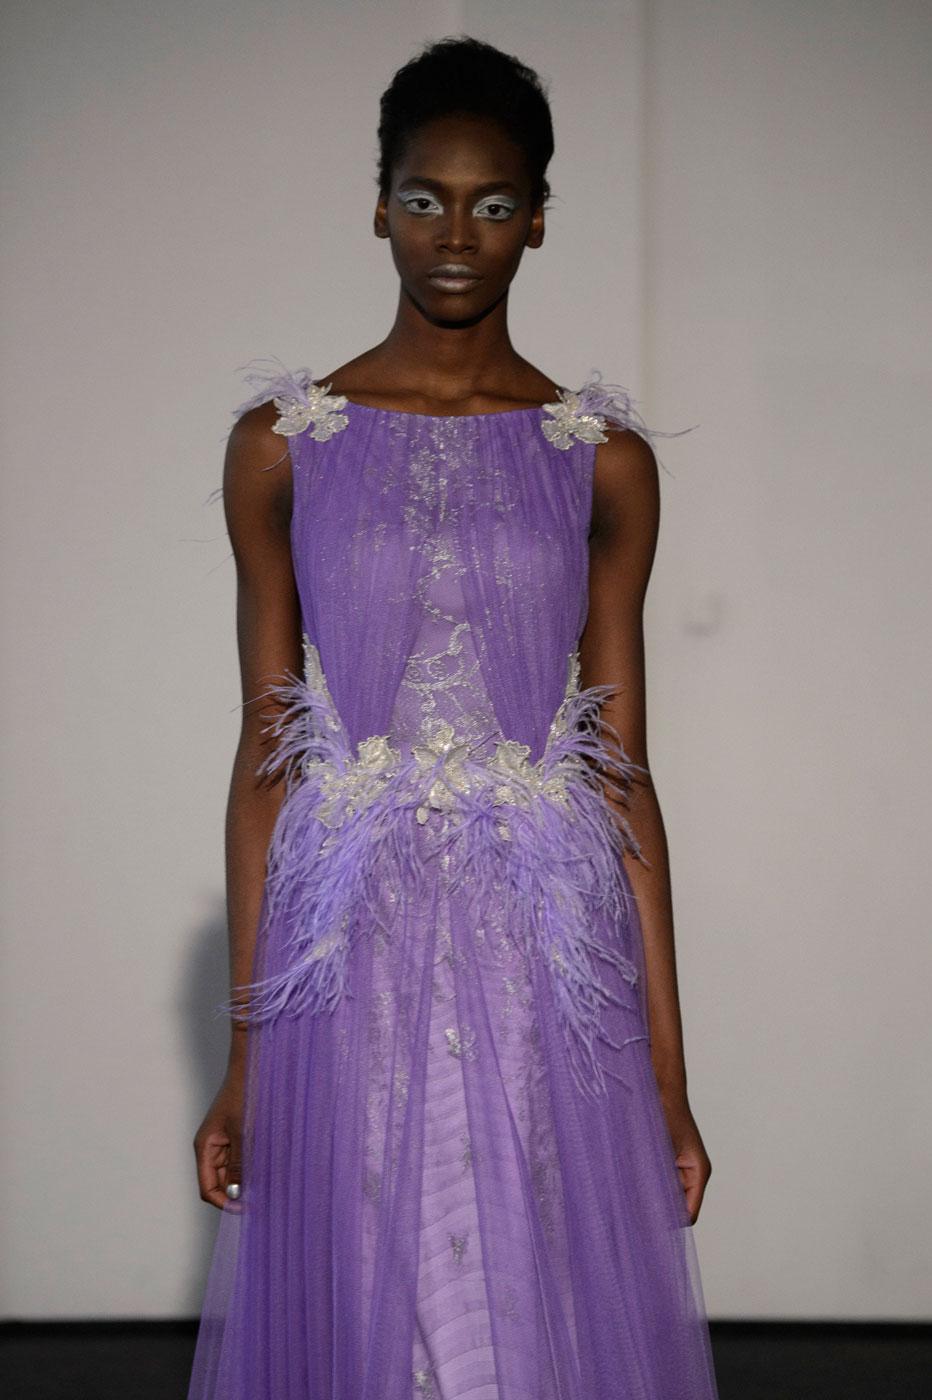 Busardi-fashion-runway-show-haute-couture-paris-spring-2015-the-impression-56